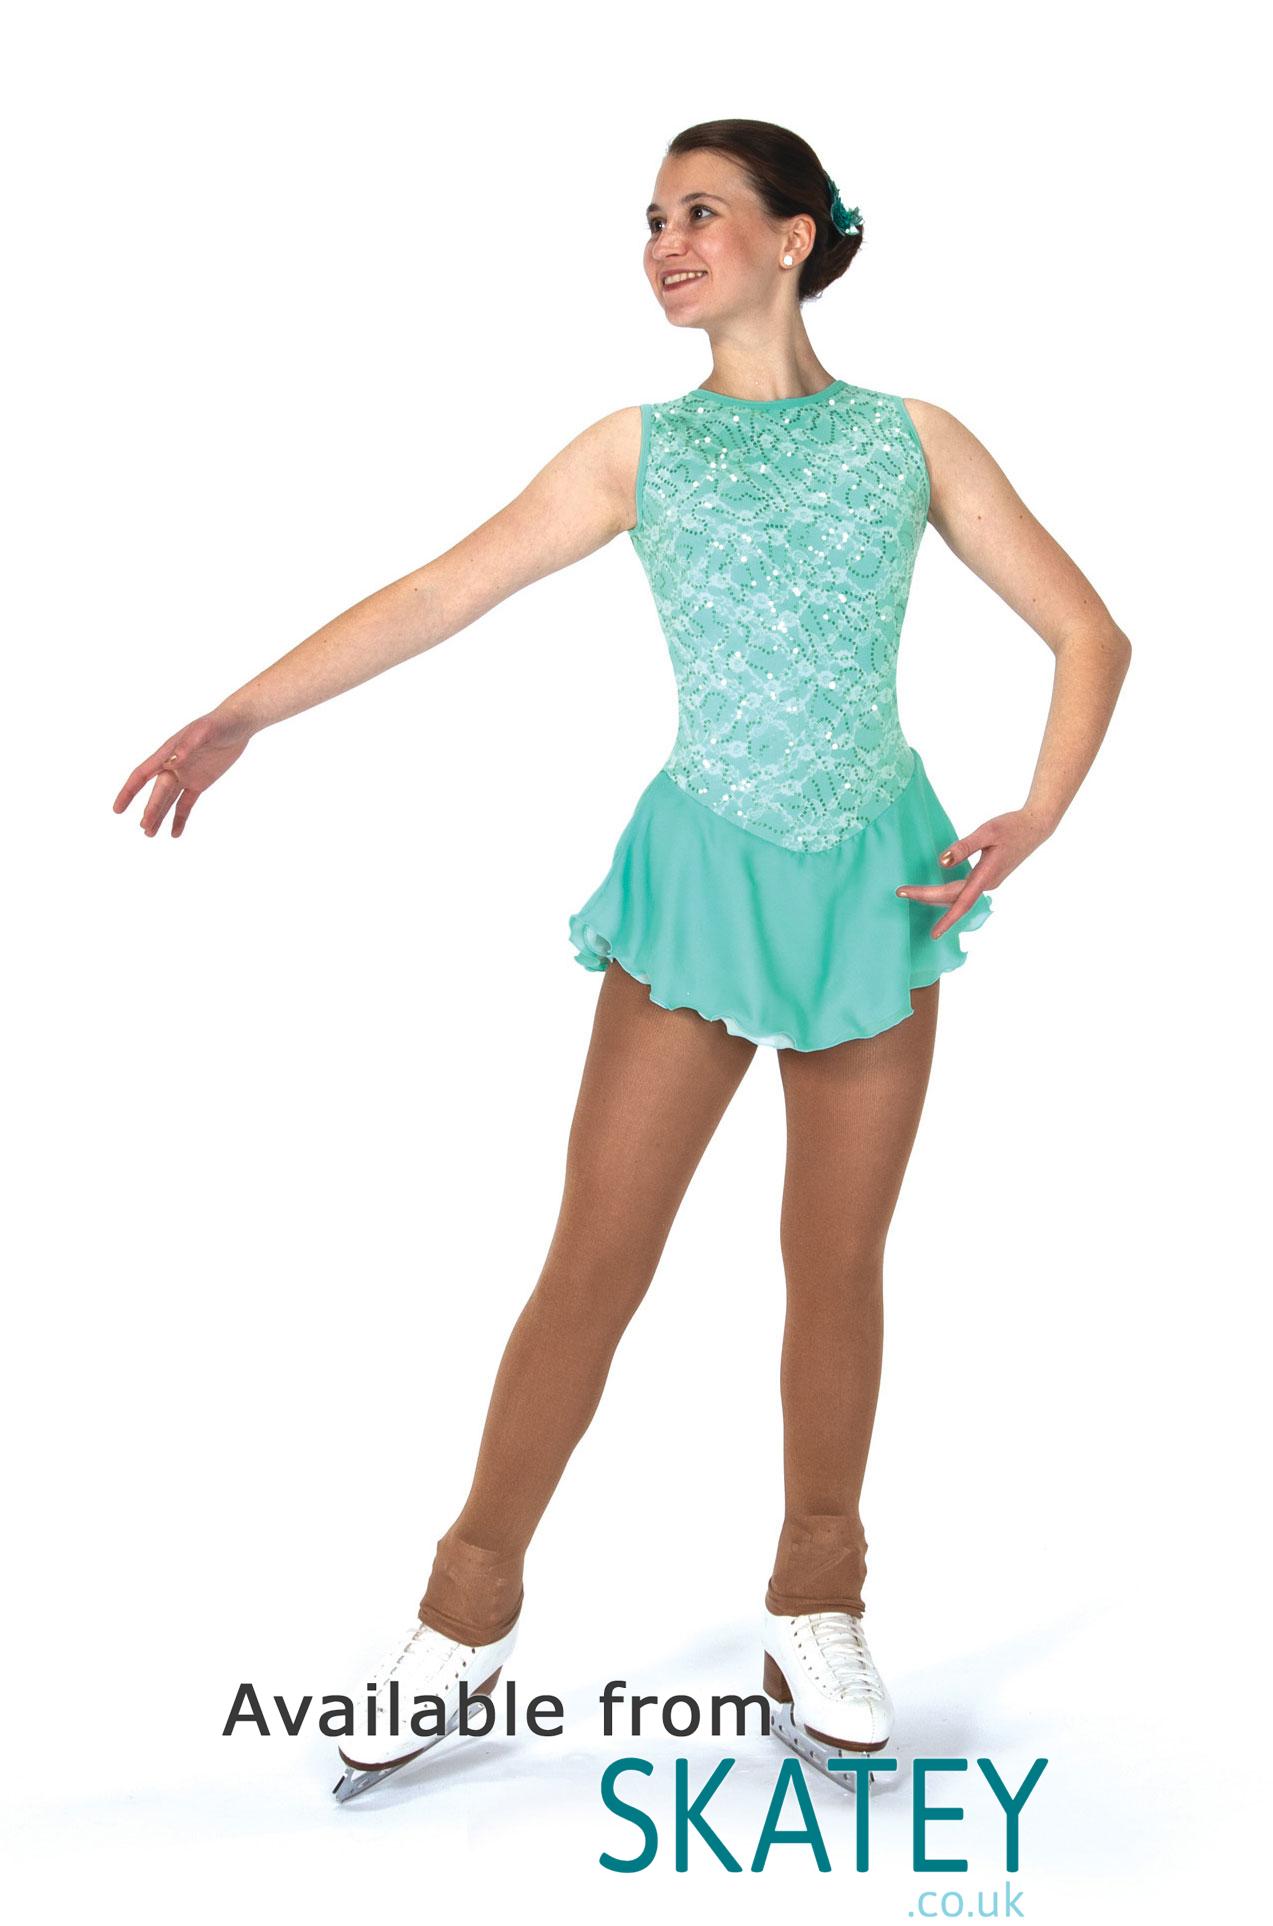 Mint Julep Ice Skating Dress From Skatey co uk